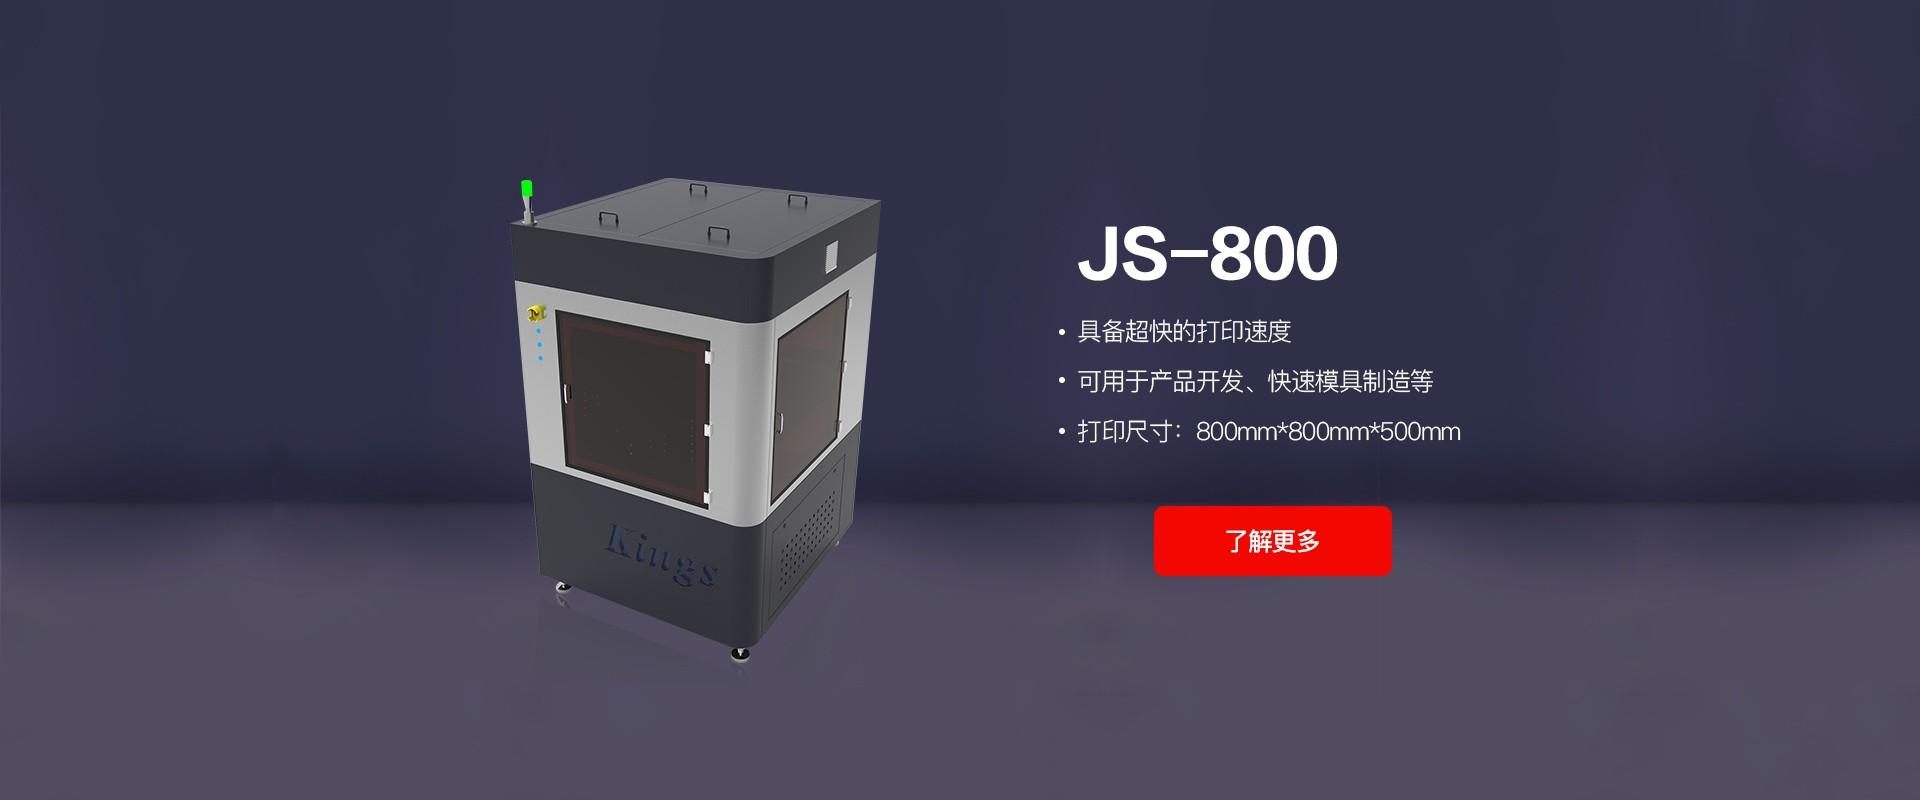 JS-800